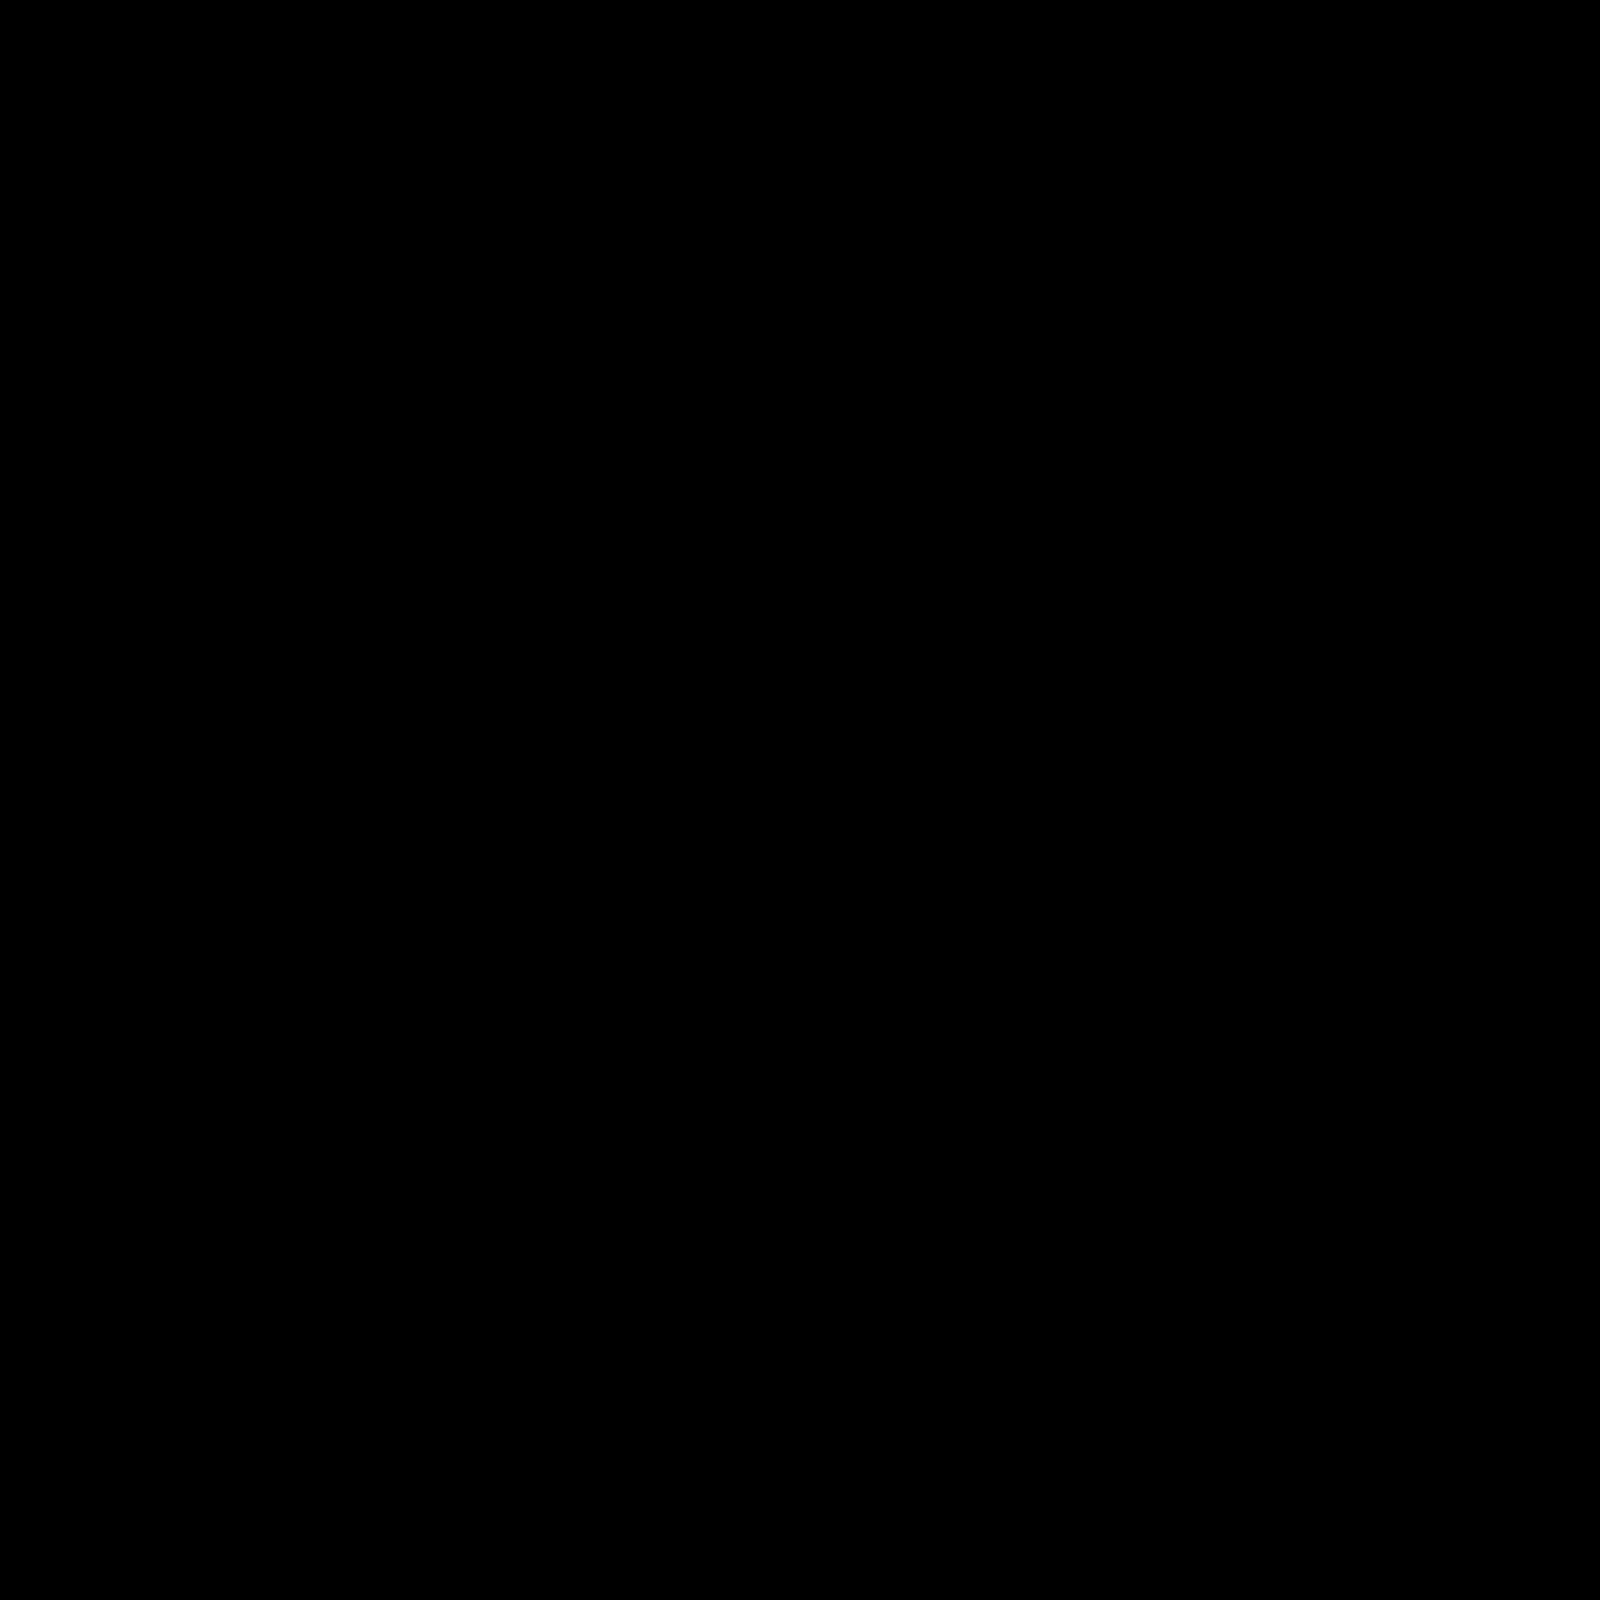 Checked Radio Button icon